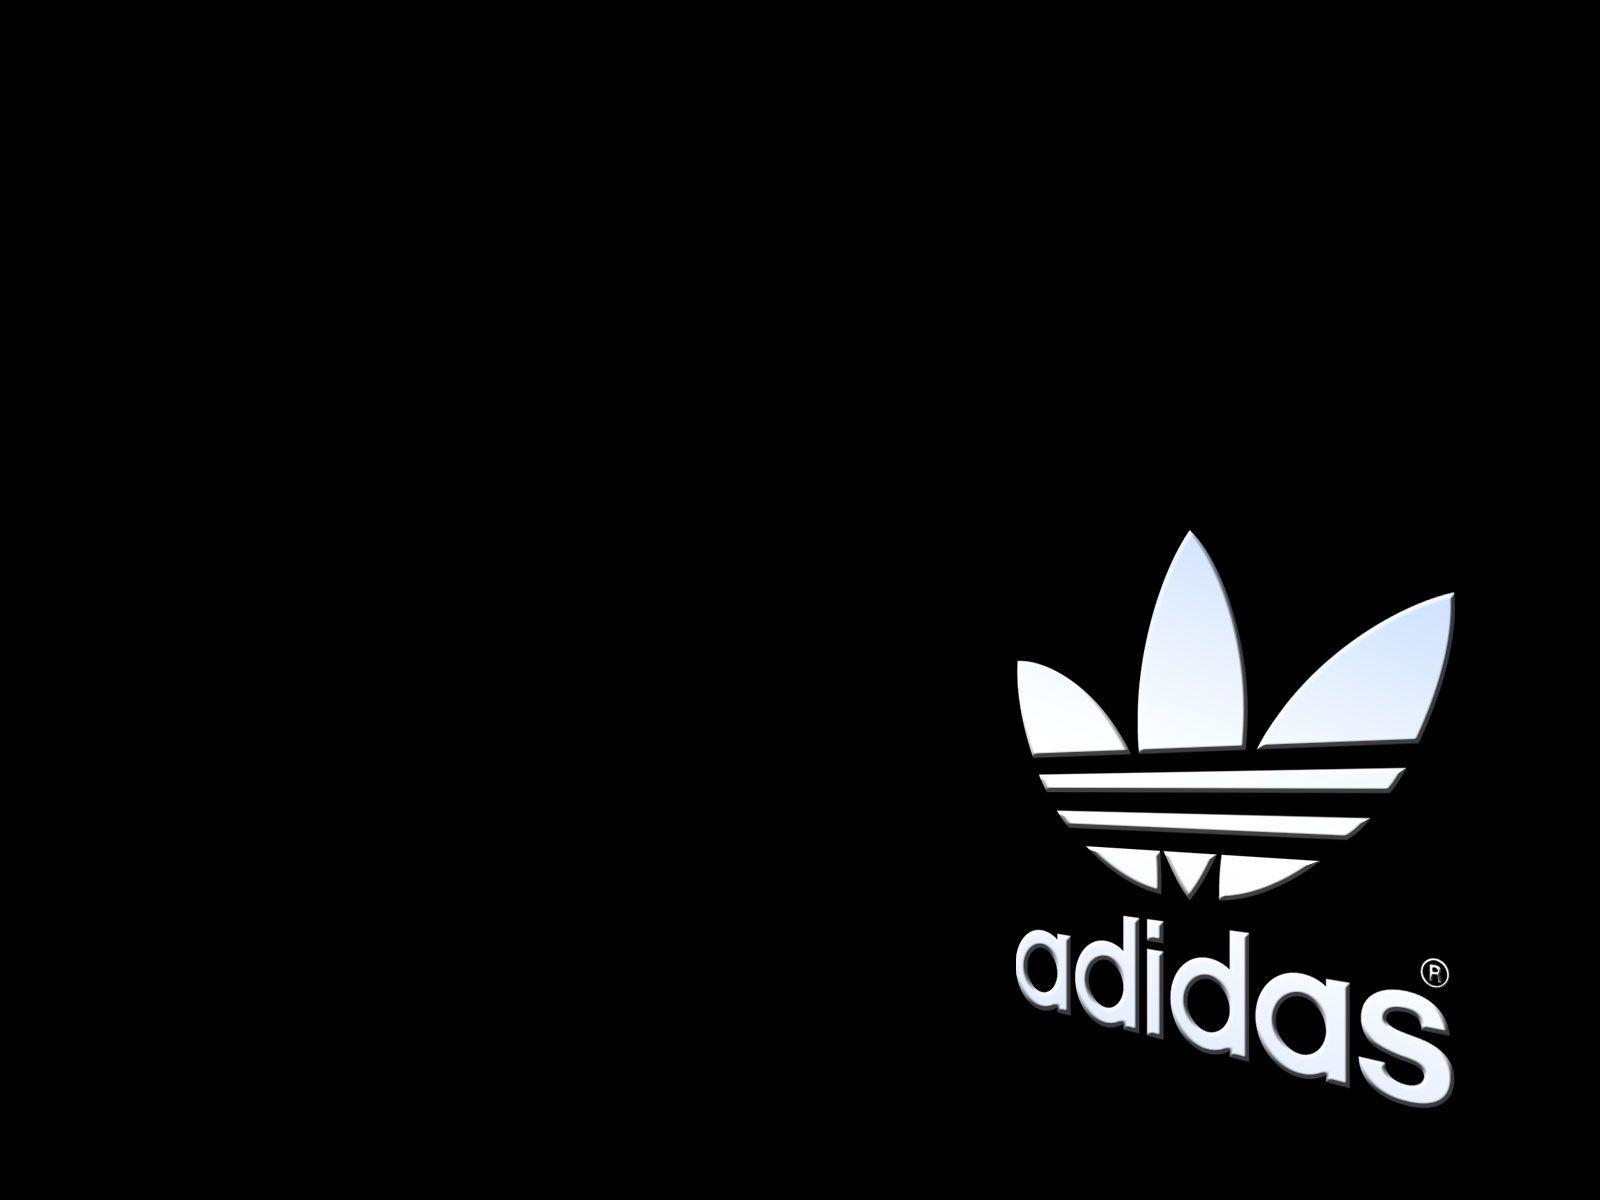 Adidas Logo Wallpapers - HD Wallpapers Inn